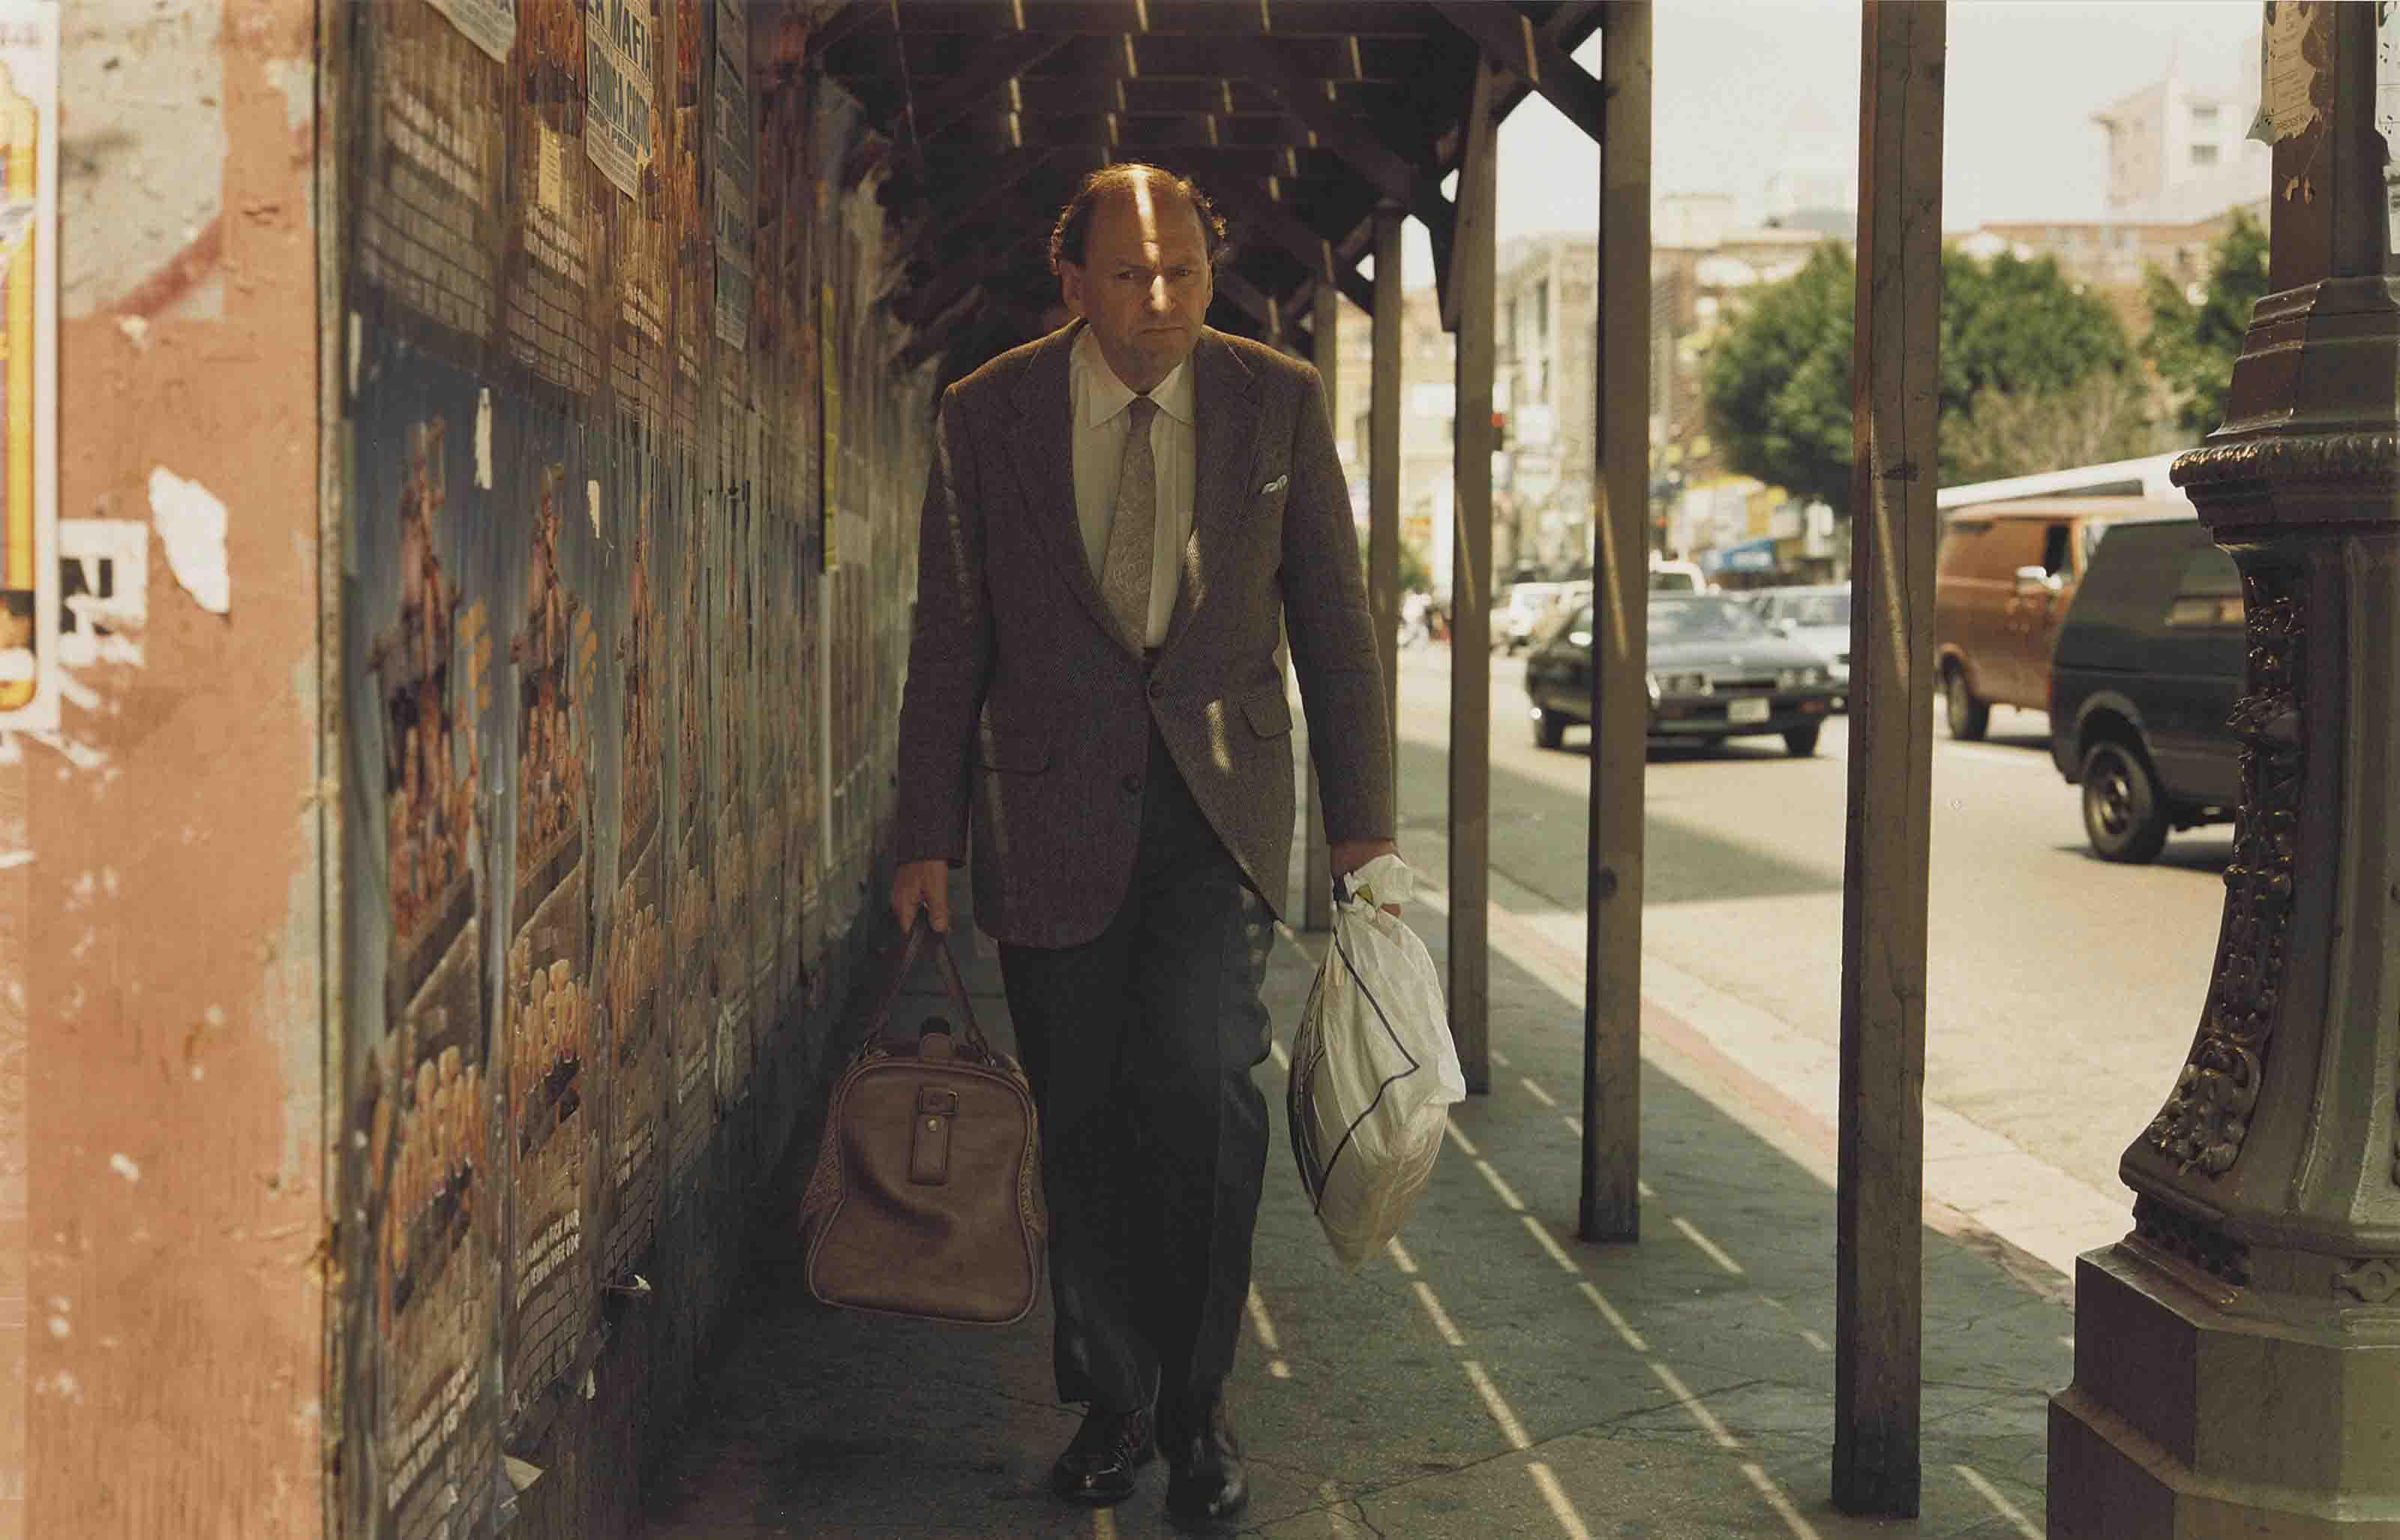 Los Angeles, 1994